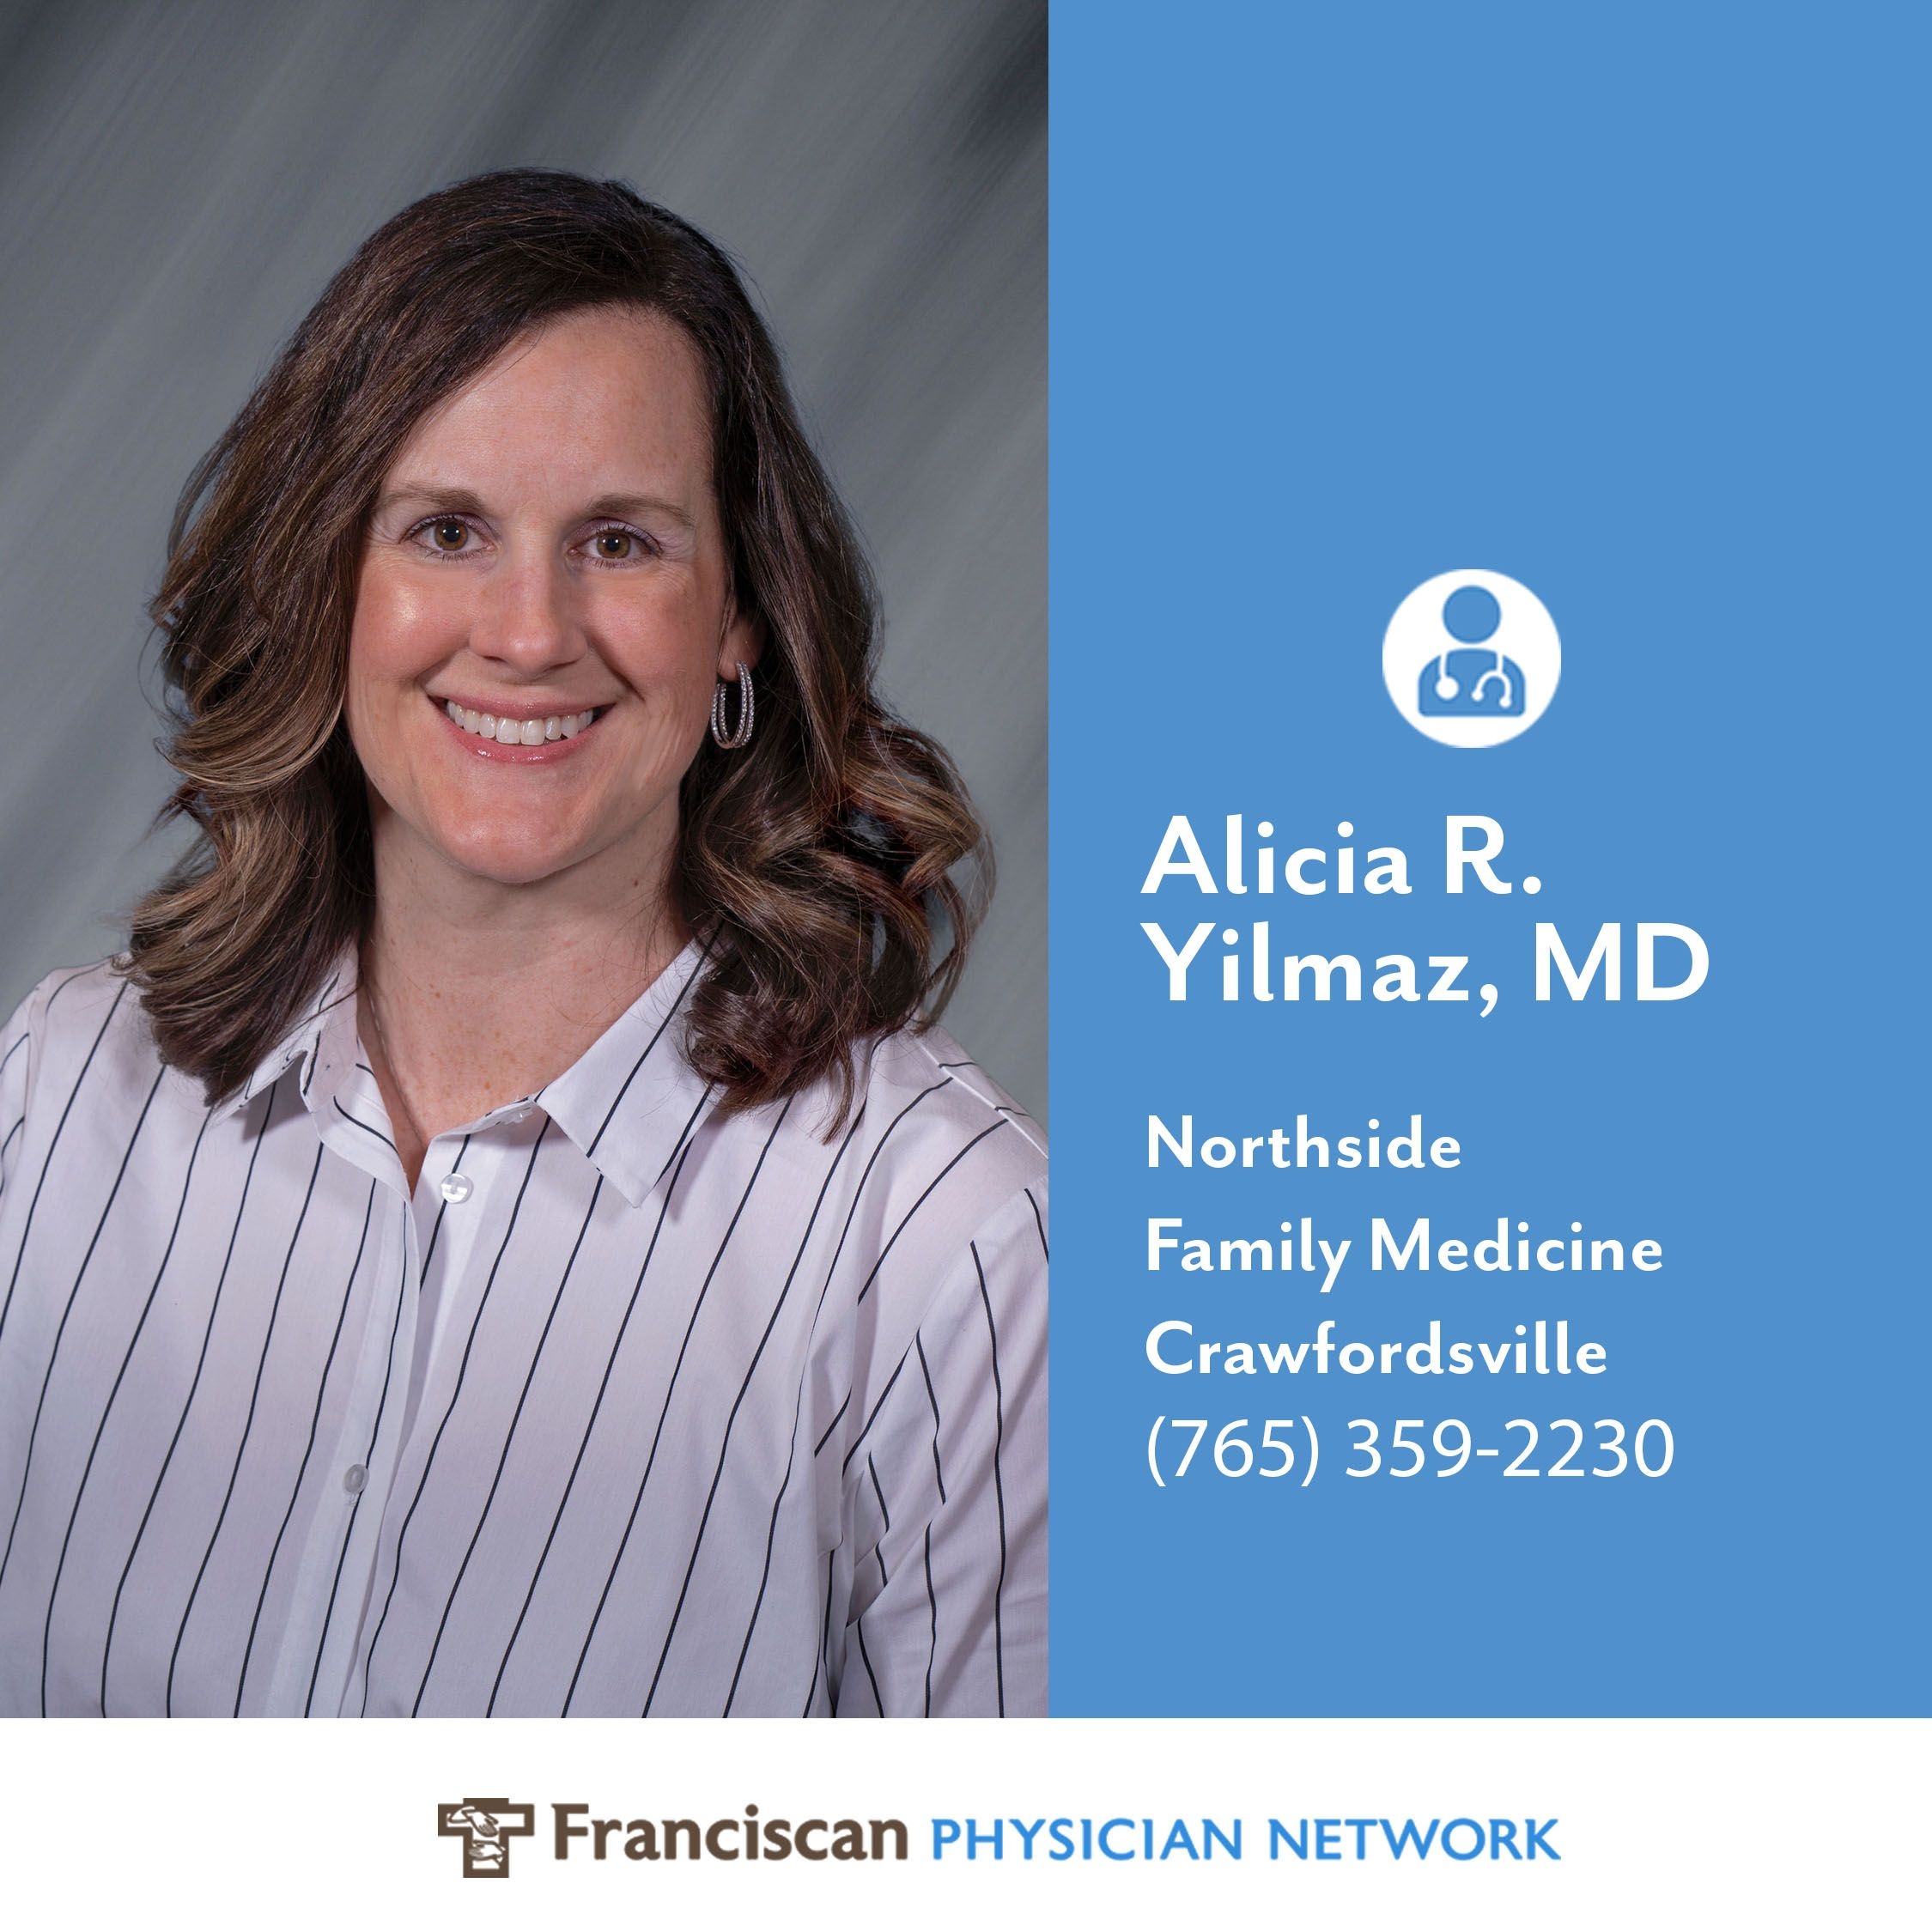 Family doctor Alicia R. Yilmaz, MD, has established a